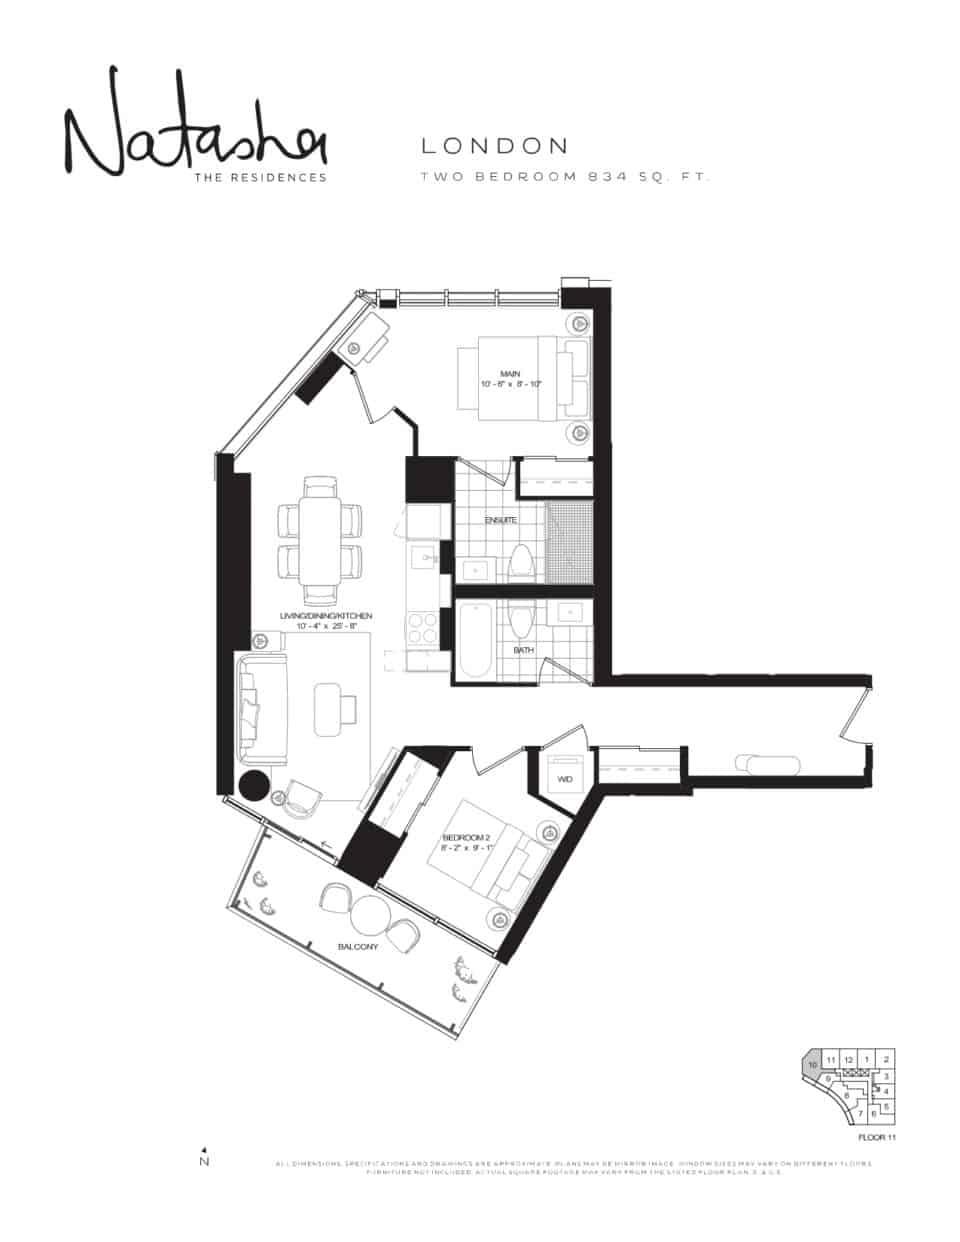 2021 09 02 11 02 24 natashatheresidences lanterradevelopments floorplans london